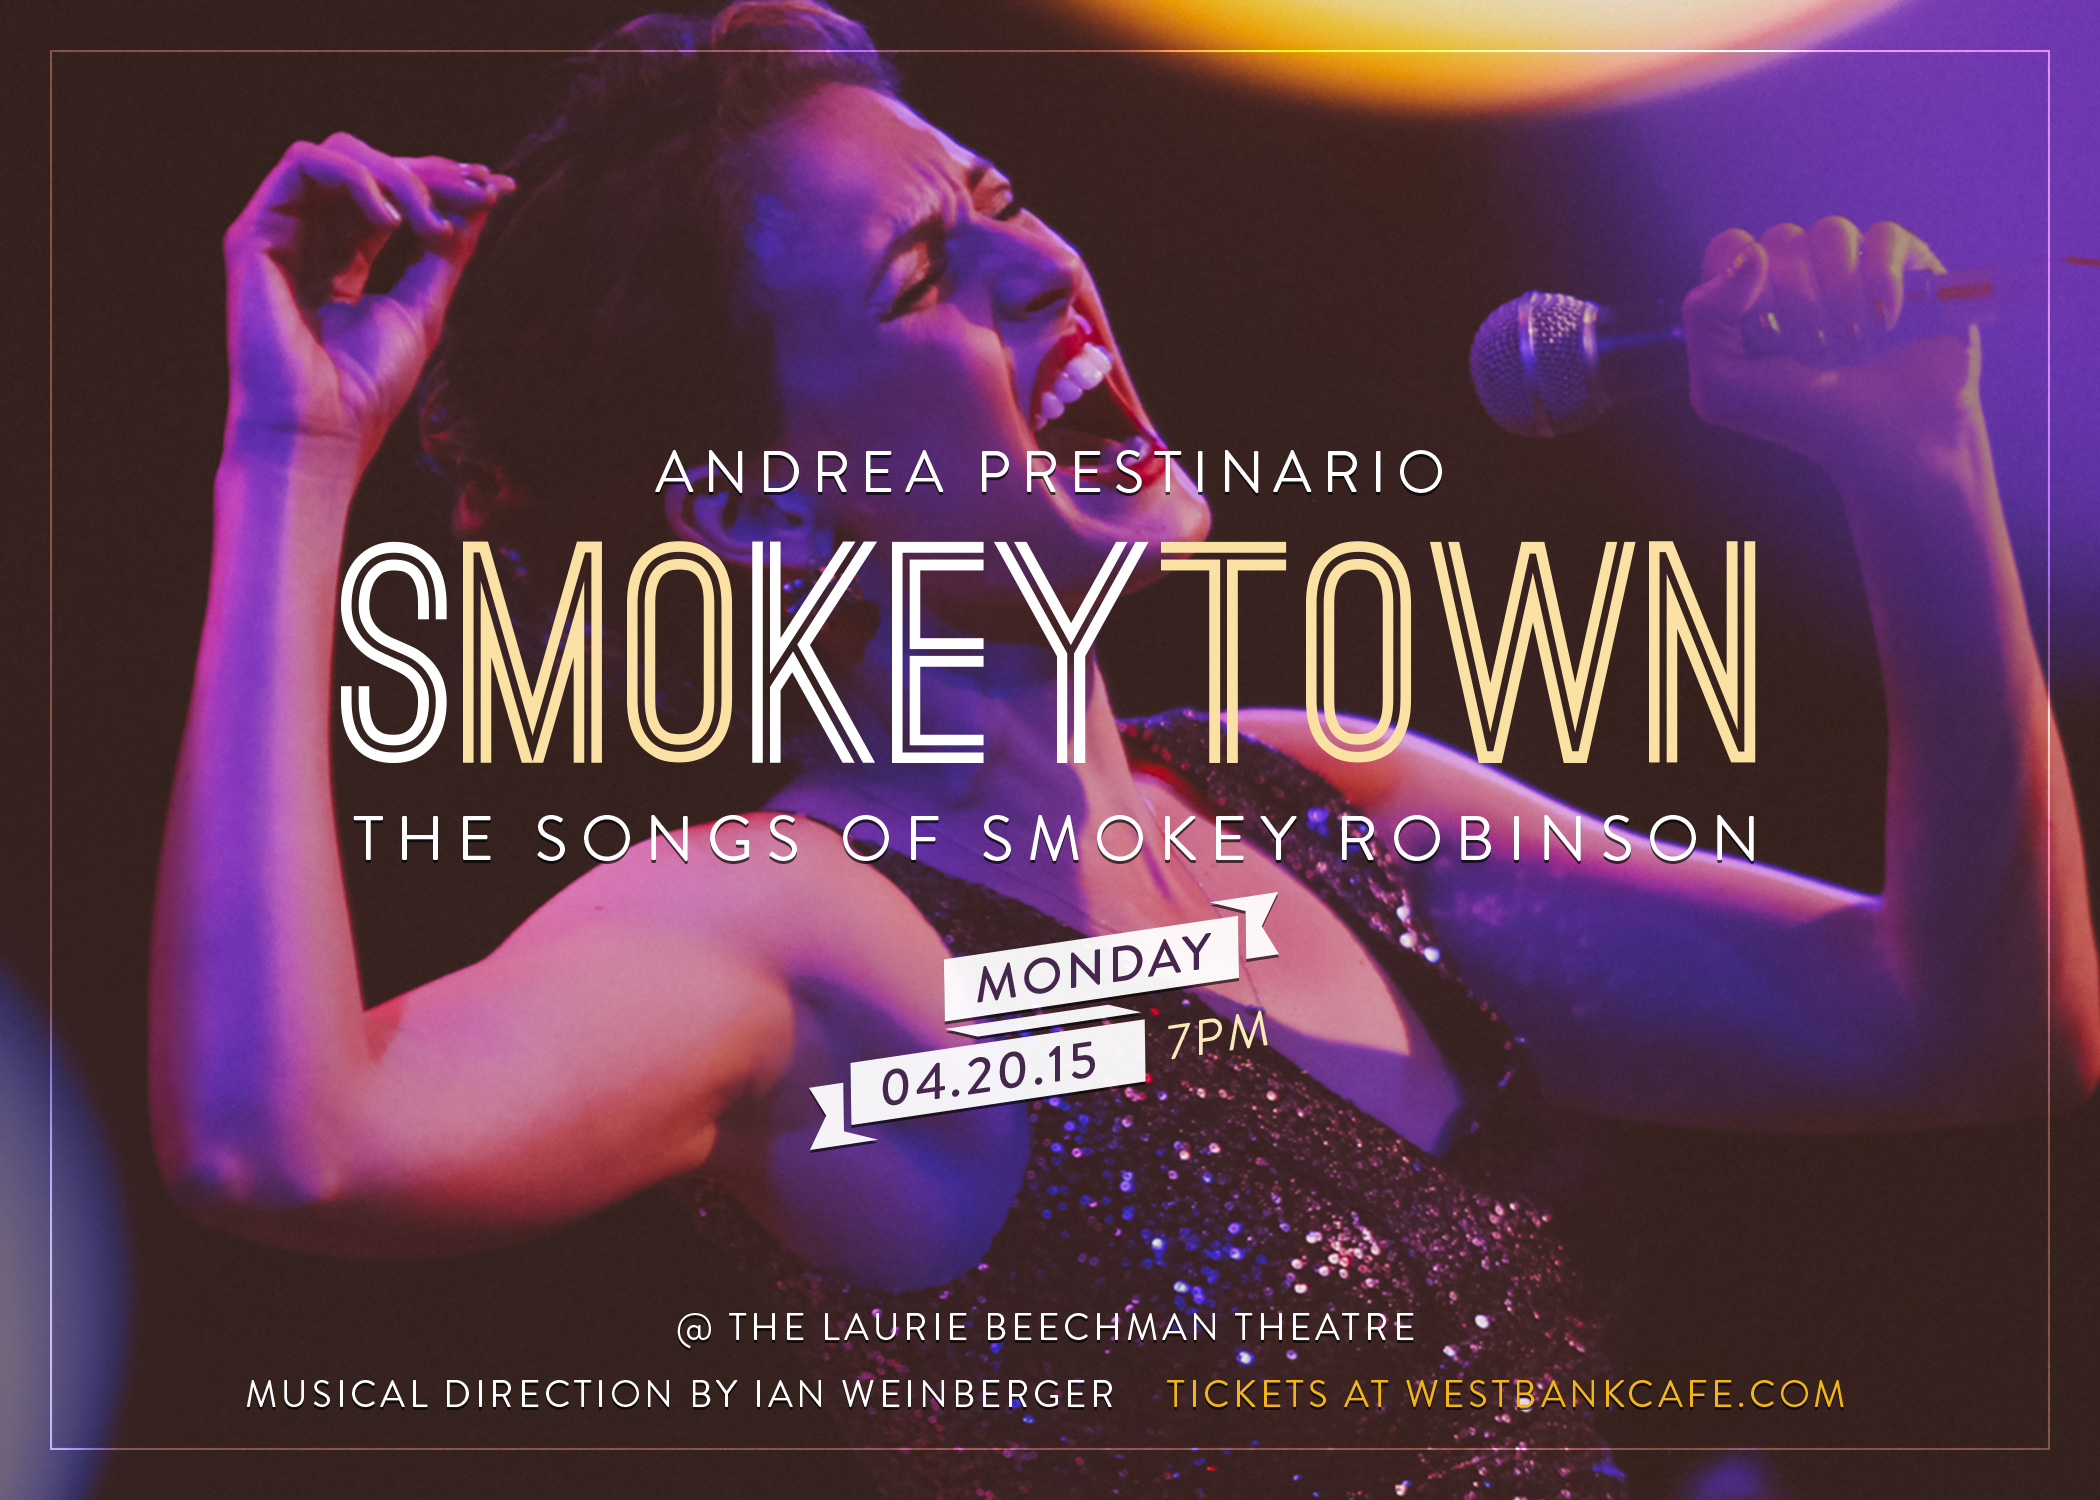 smokeytown-the-songs-of-smokey-robinson_18317443924_o.jpg